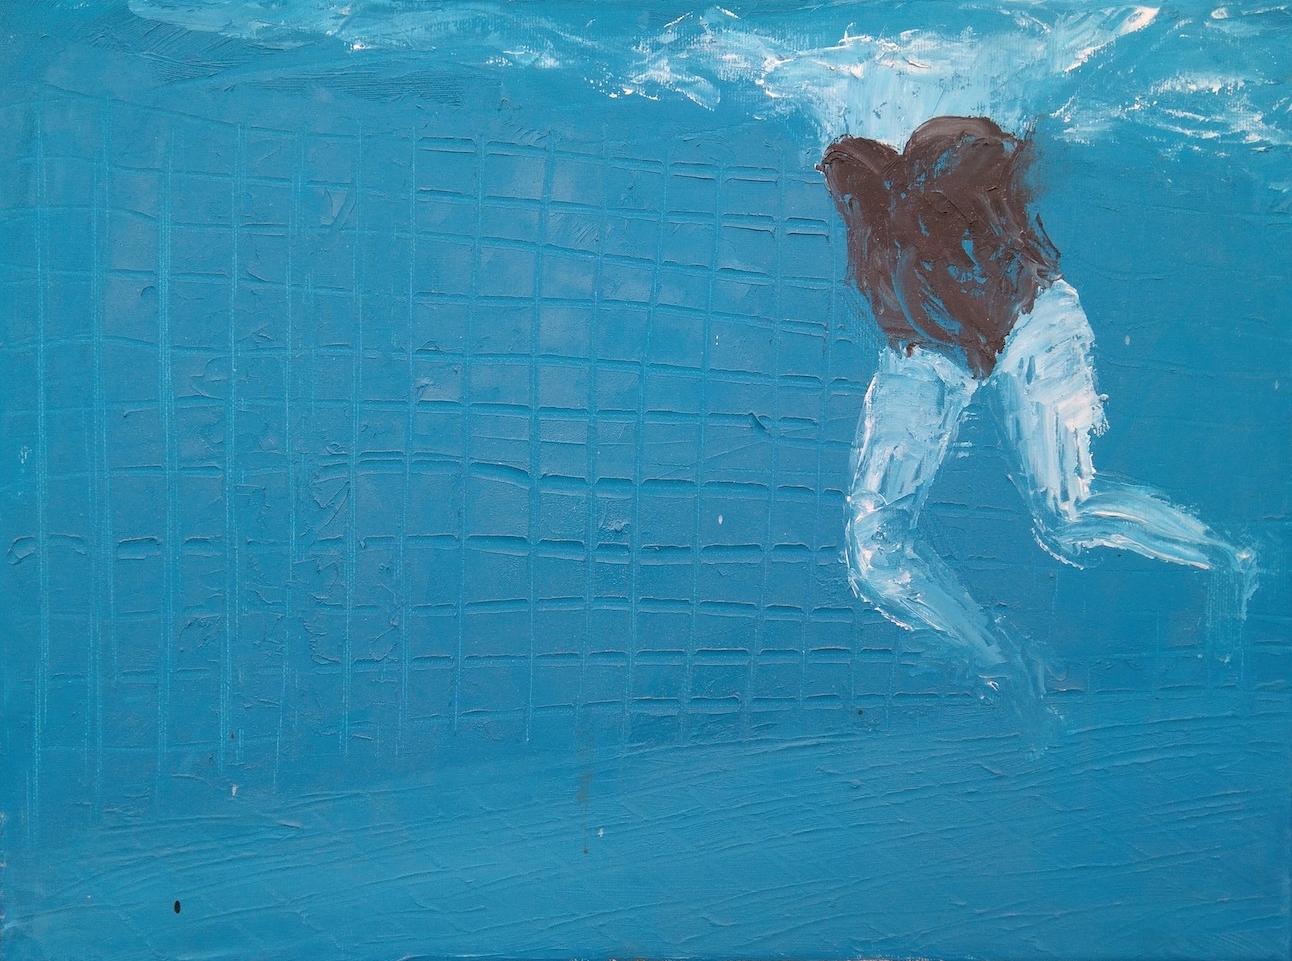 piscina-sola-nada-cort